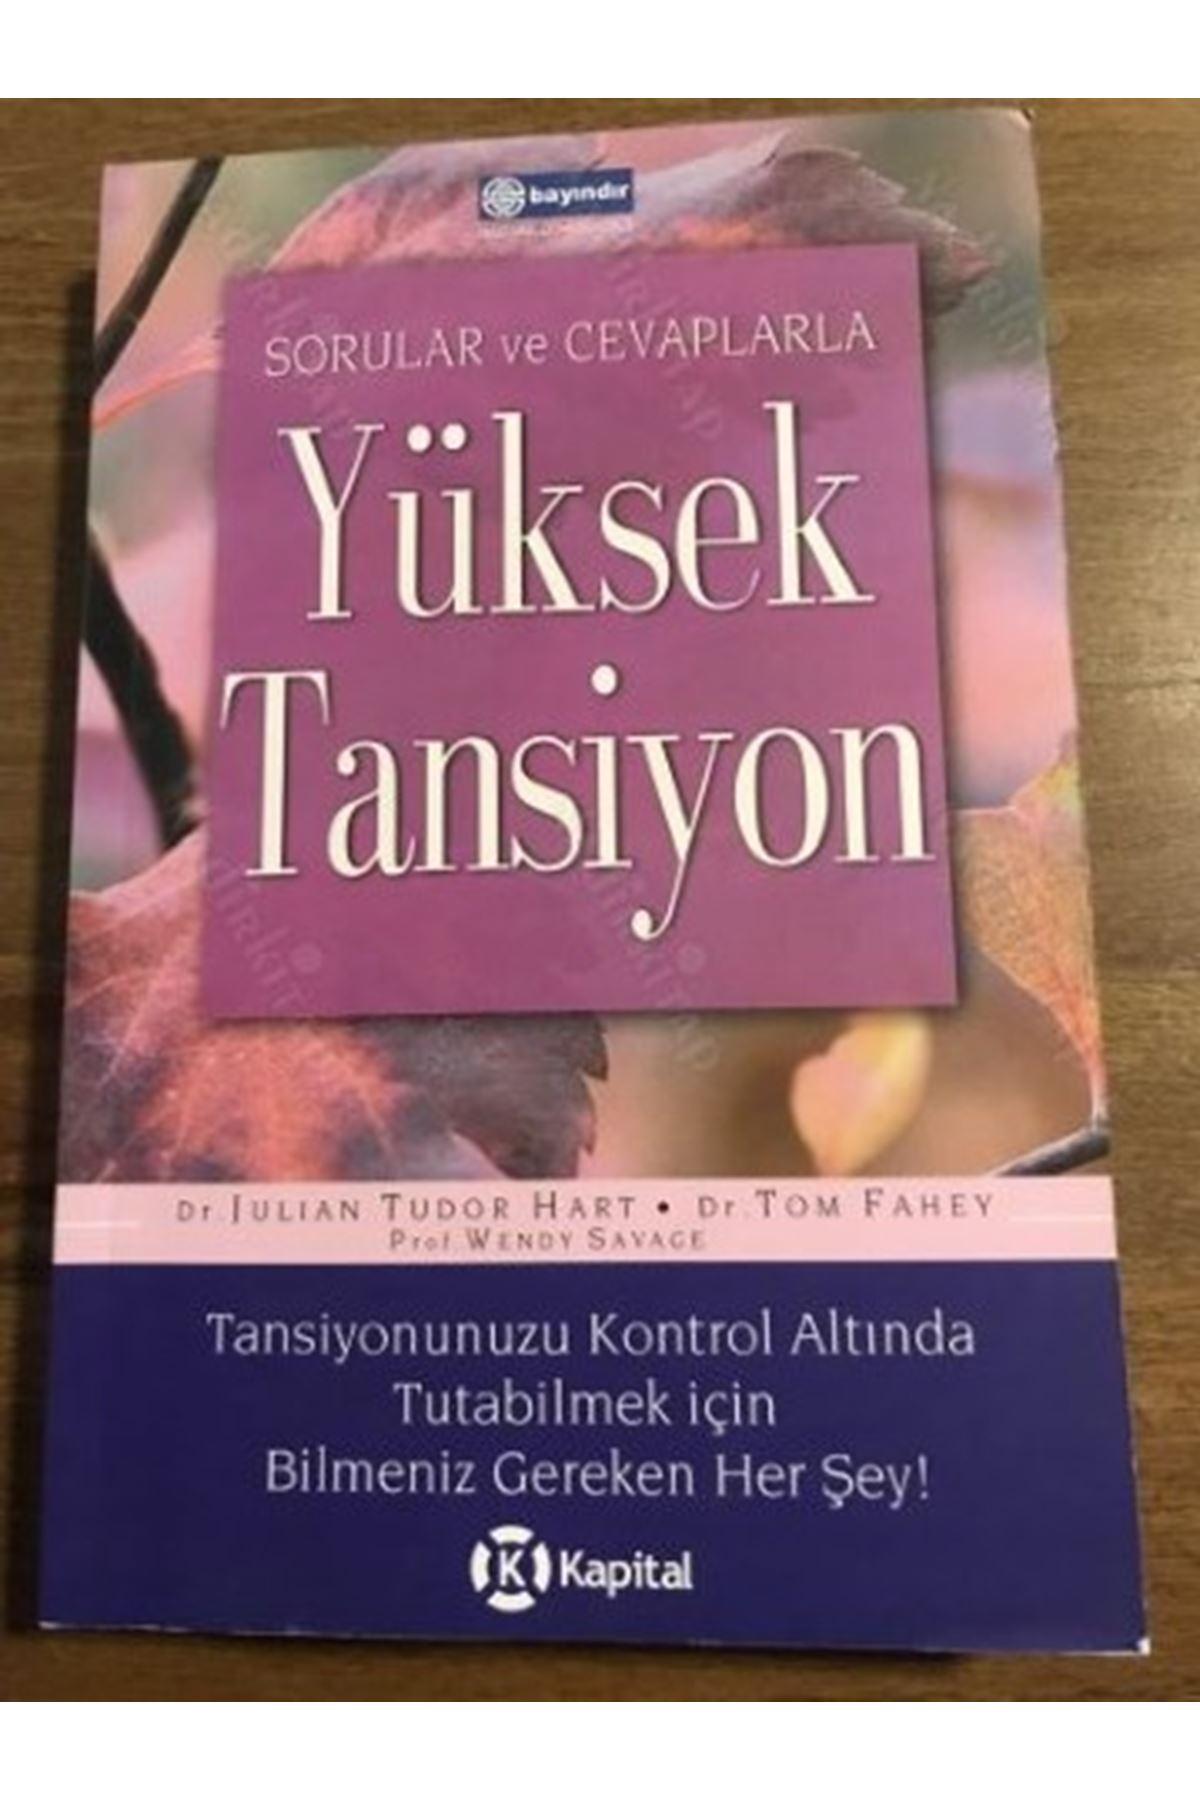 DR.JULIAN TUDOR HART - YÜKSEK TANSİYON